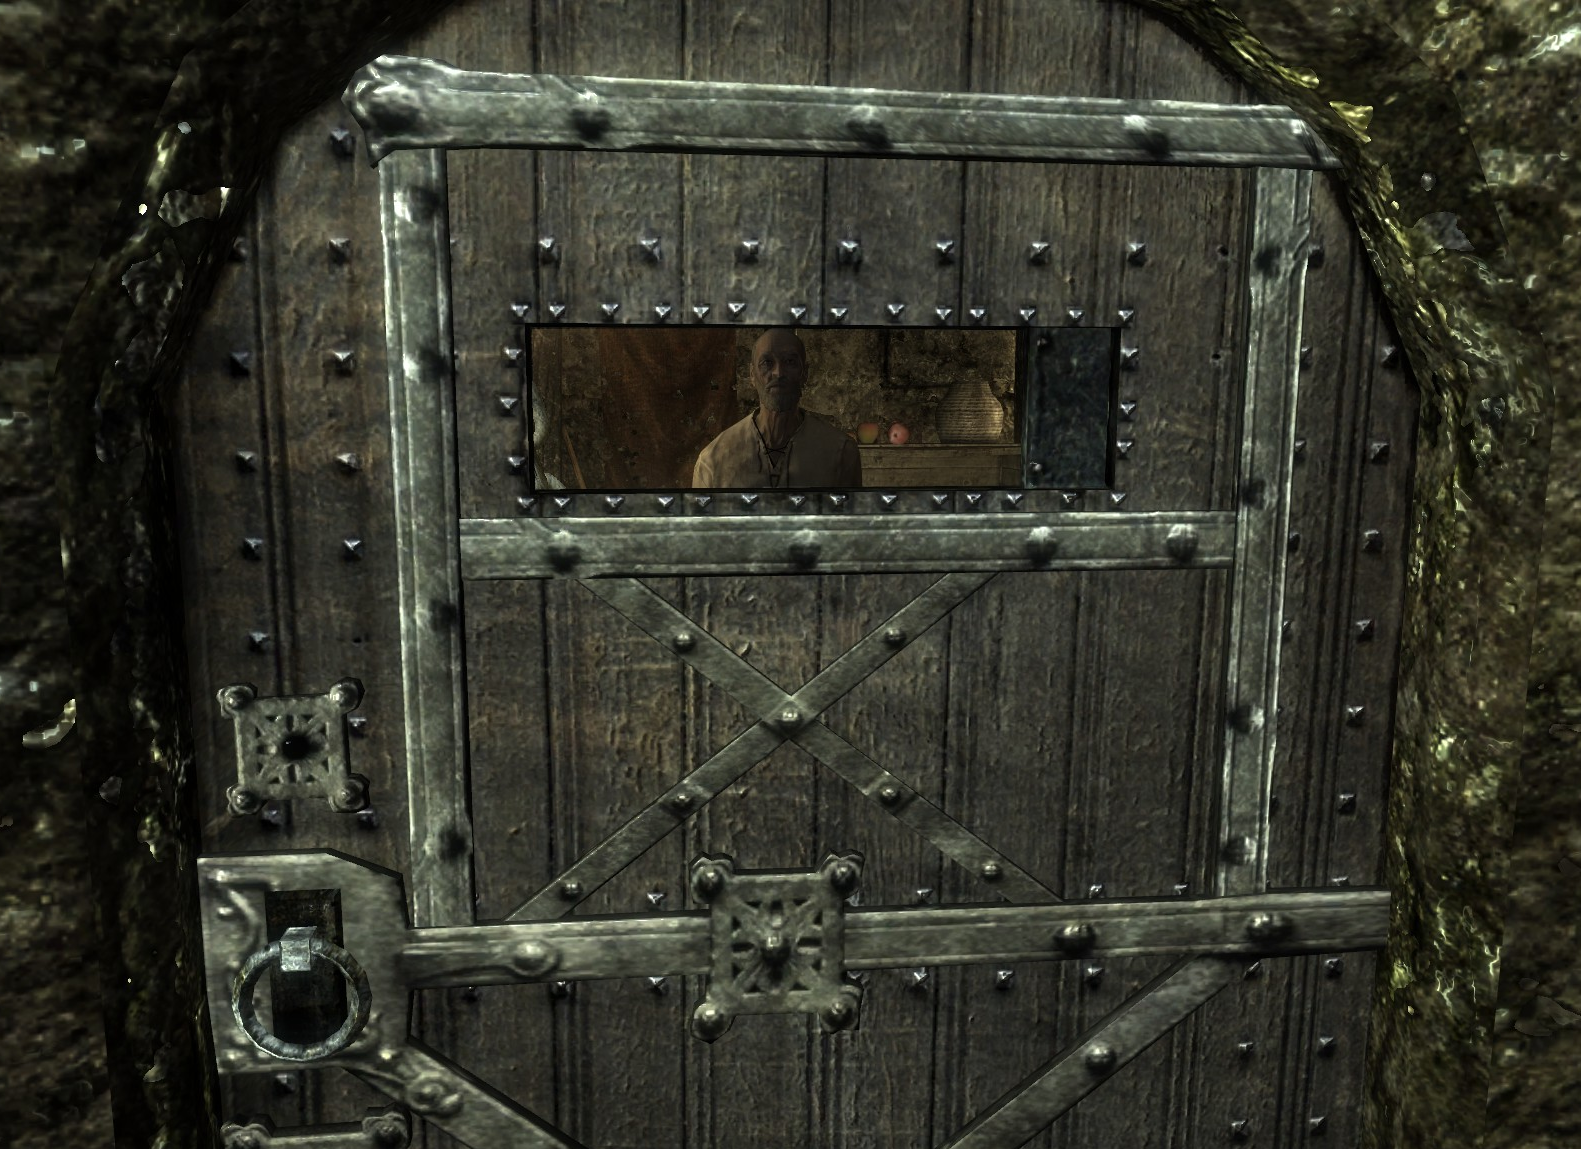 A Cornered Rat & A Cornered Rat | Elder Scrolls | FANDOM powered by Wikia